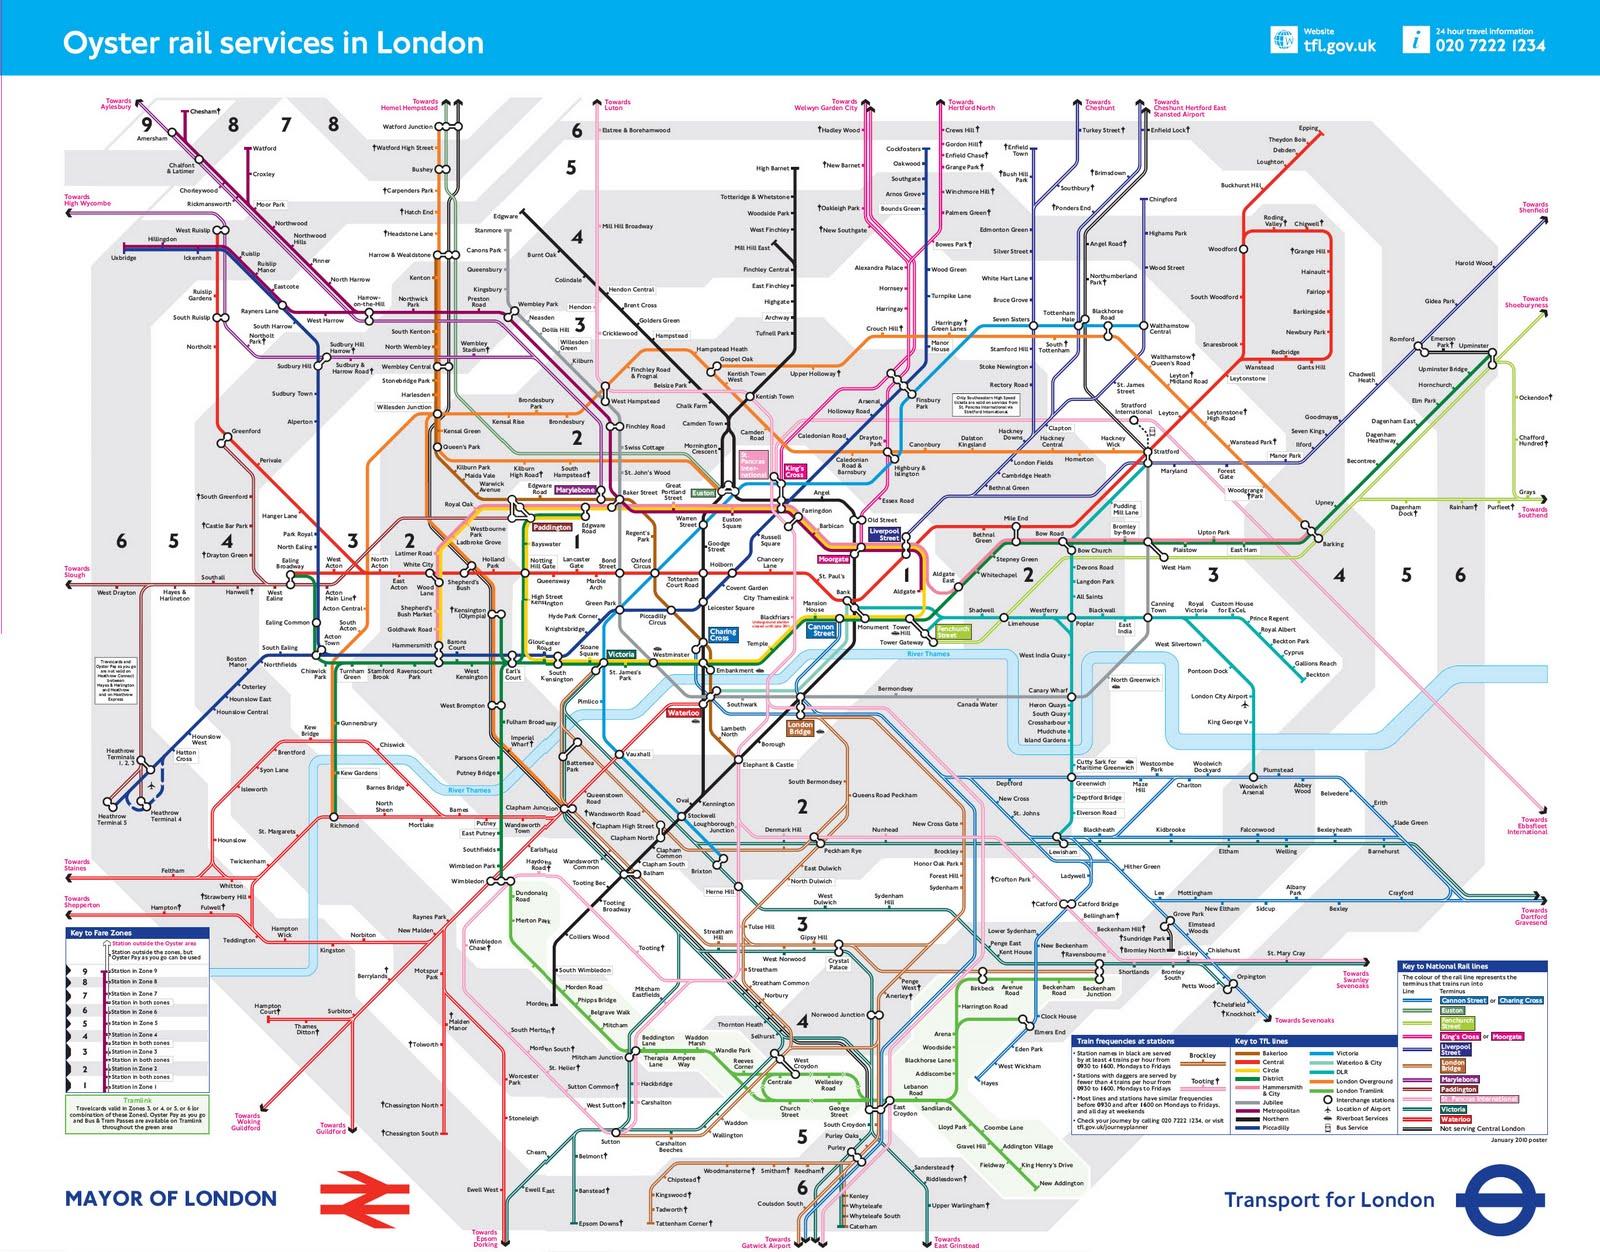 London Travel Card Zones 1 6 Map.Diamond Geezer